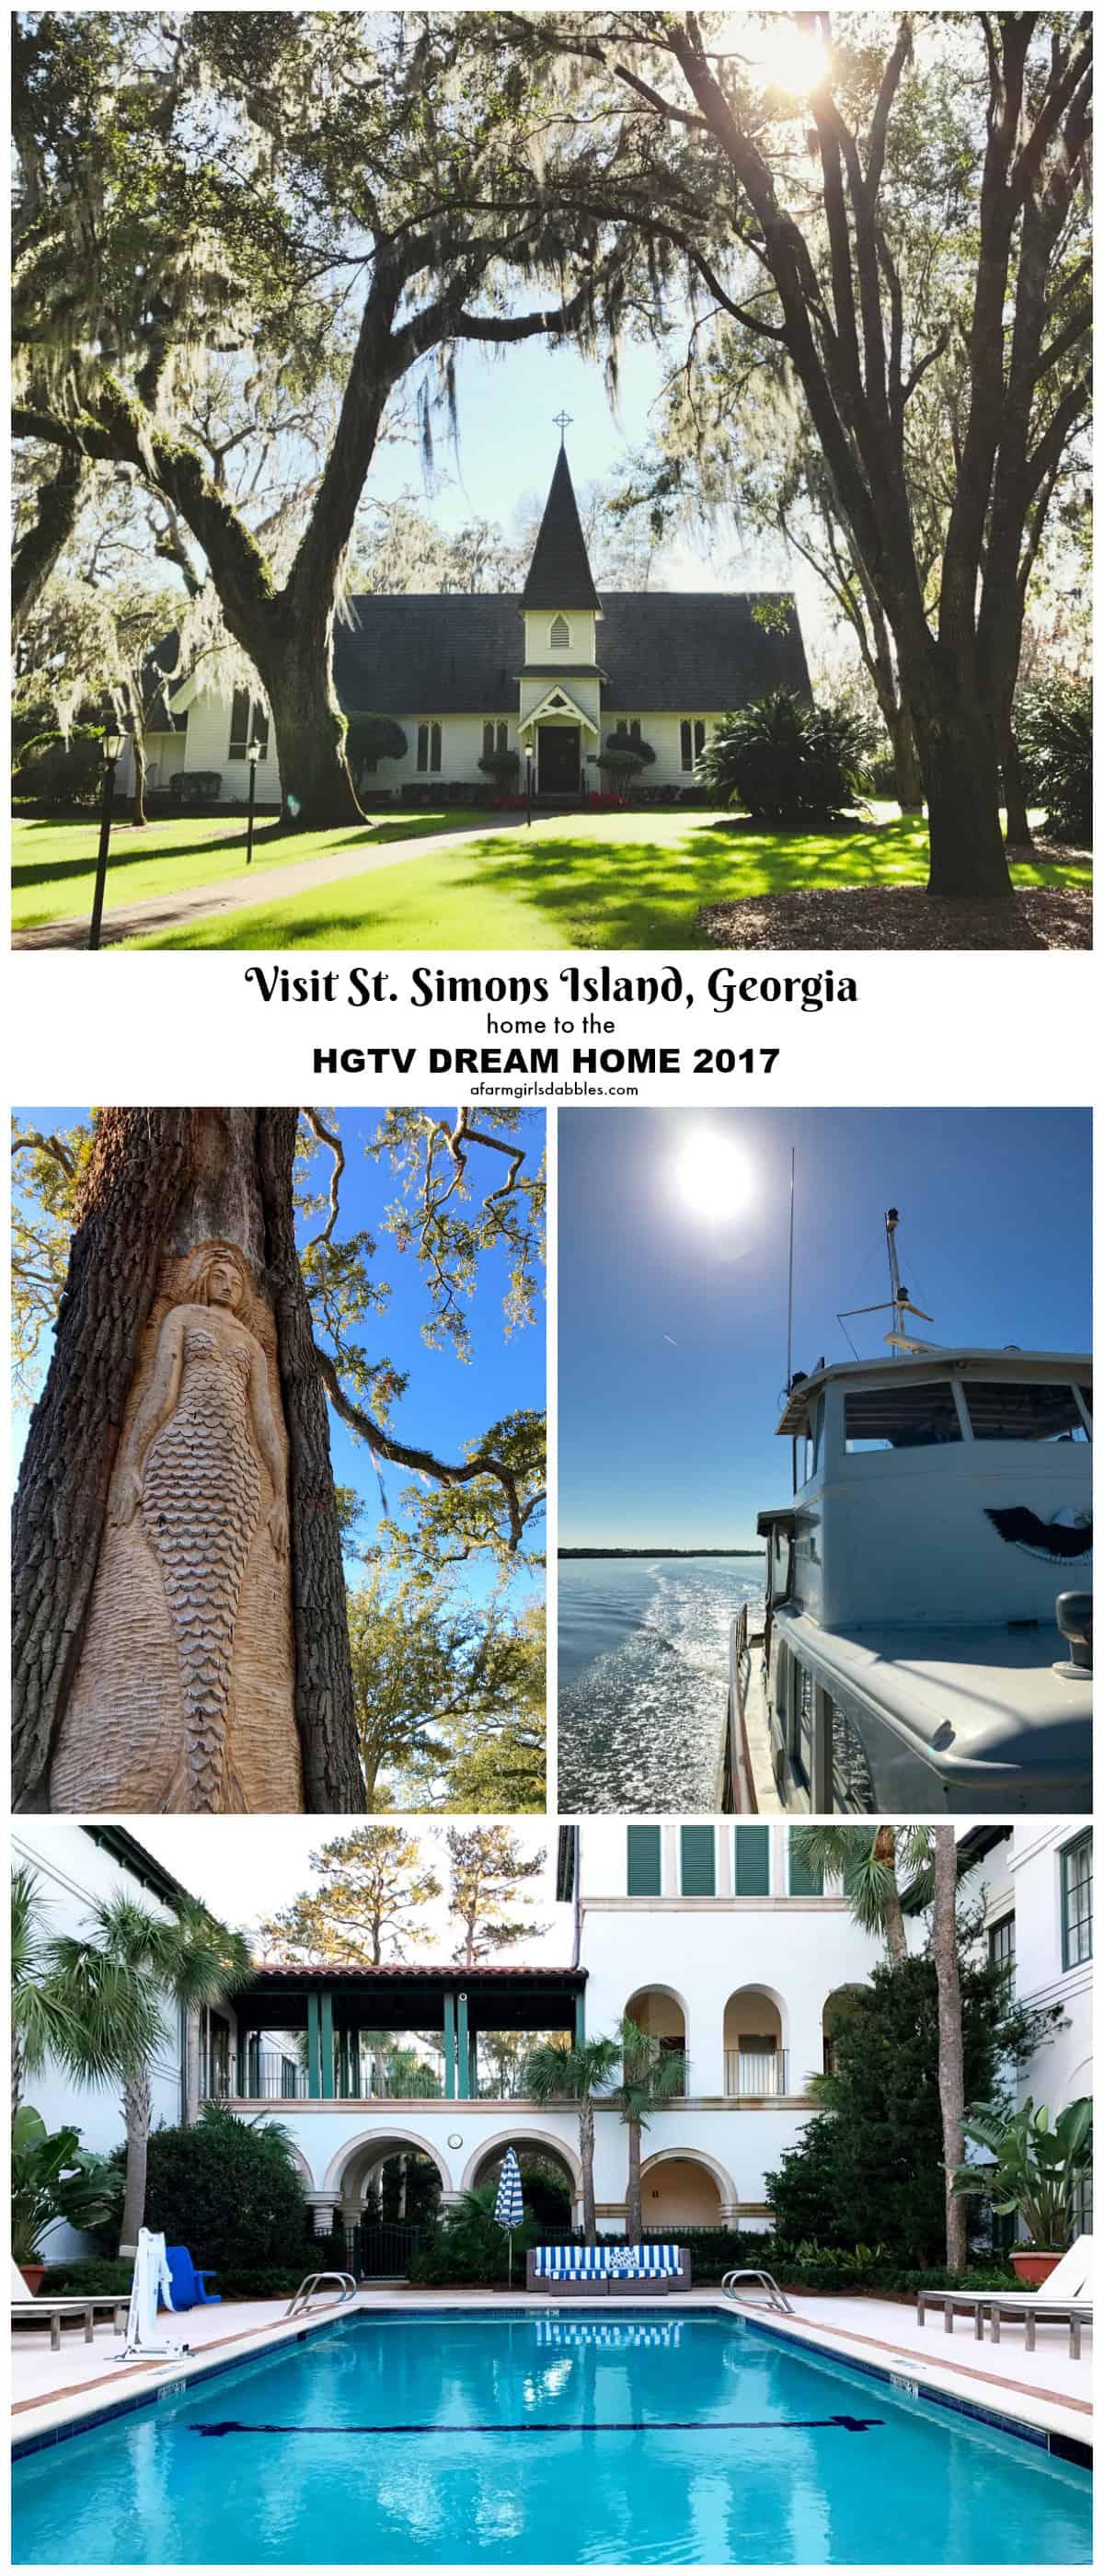 Visit St. Simons Island, Georgia - home to the HGTV Dream Home 2017 - from afarmgirlsdabbles.com